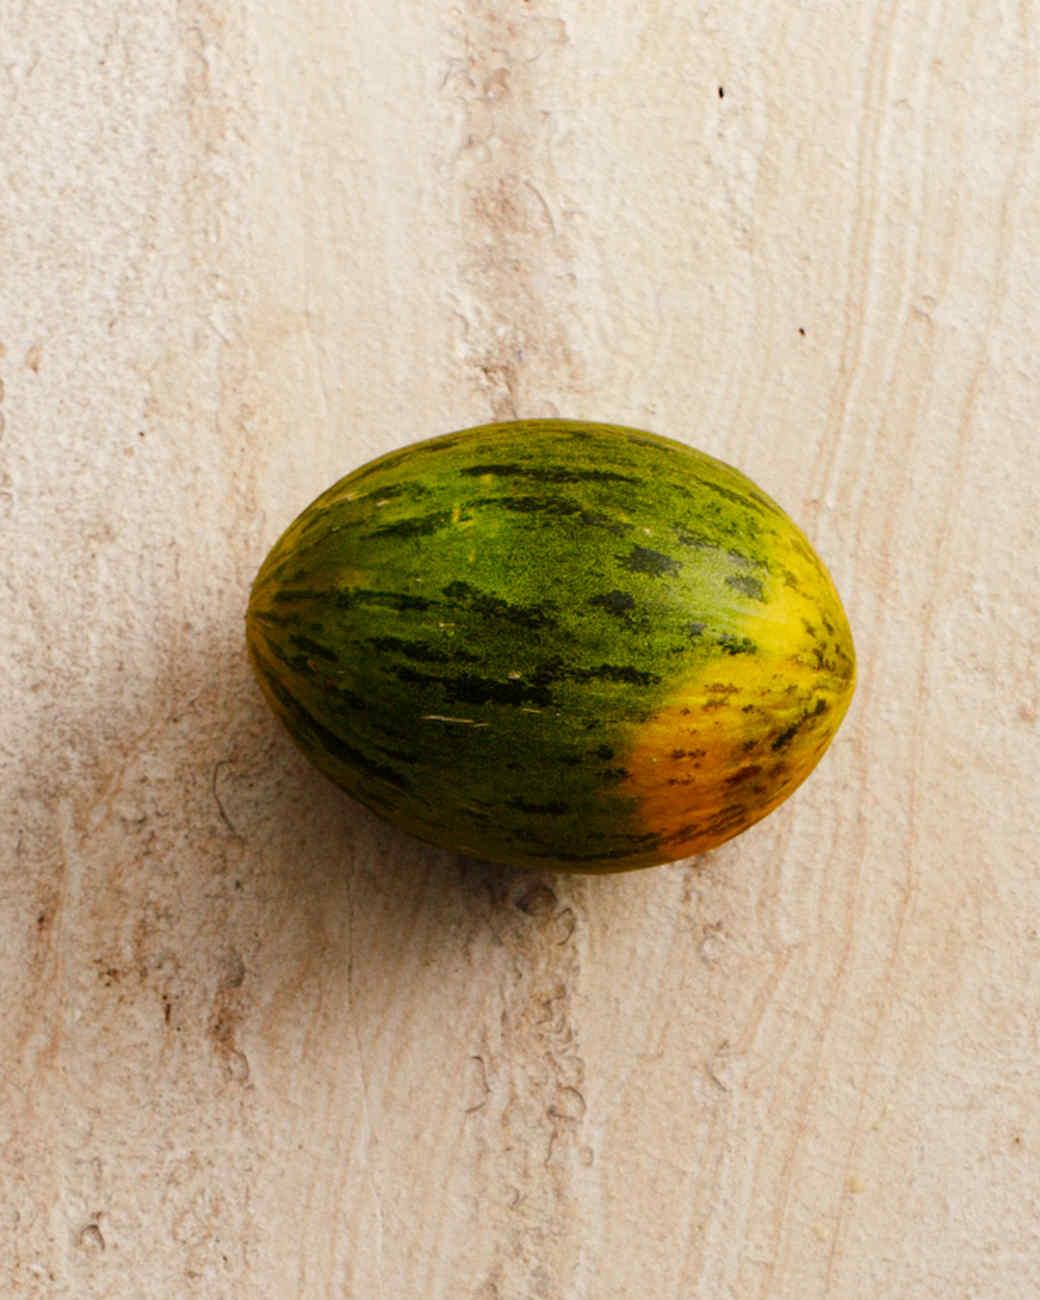 melon-ipad-santa-claus-0192-ld110630-0614.jpg